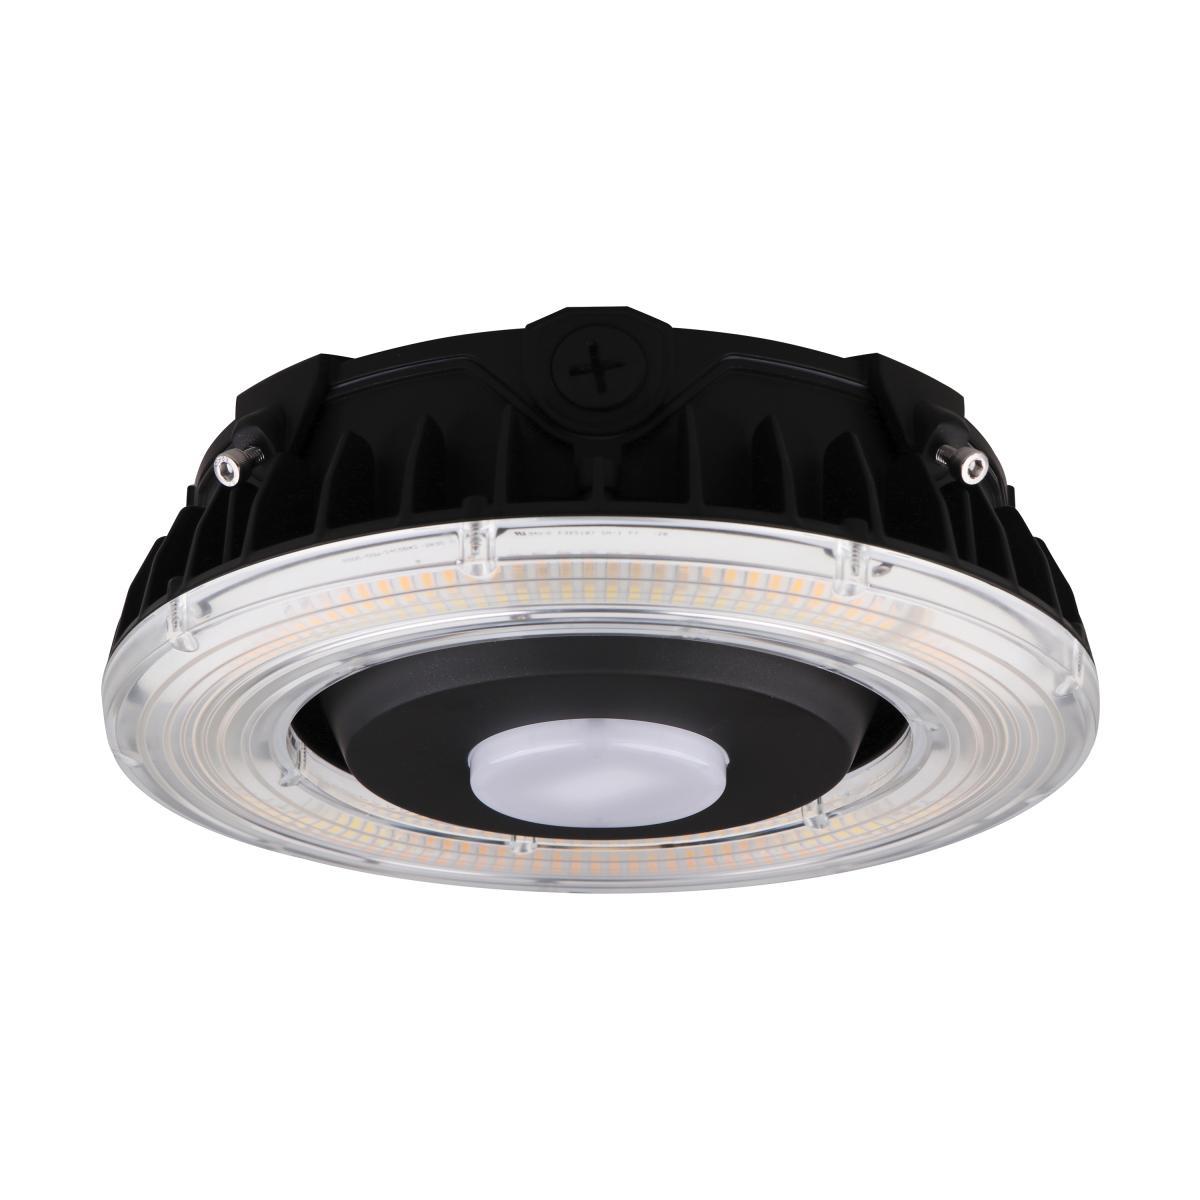 65-632 100W LED CANOPY LIGHT